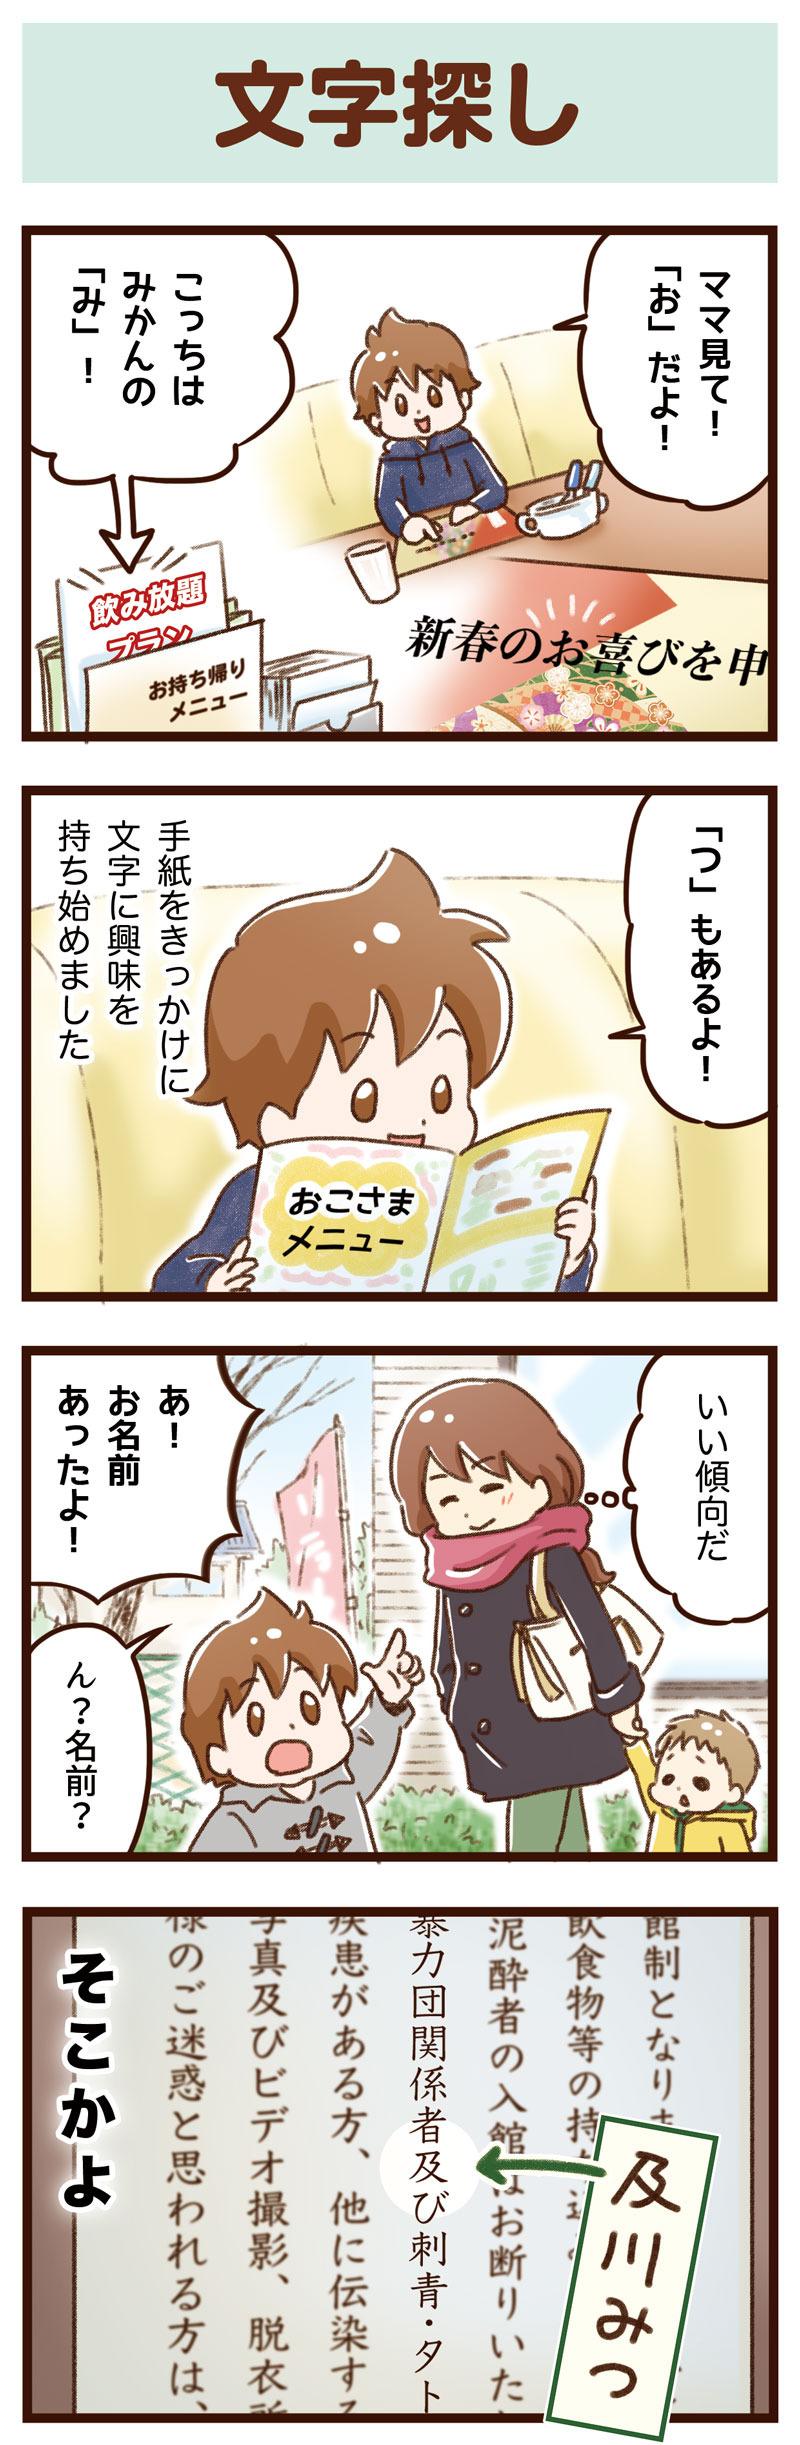 yumui246-1